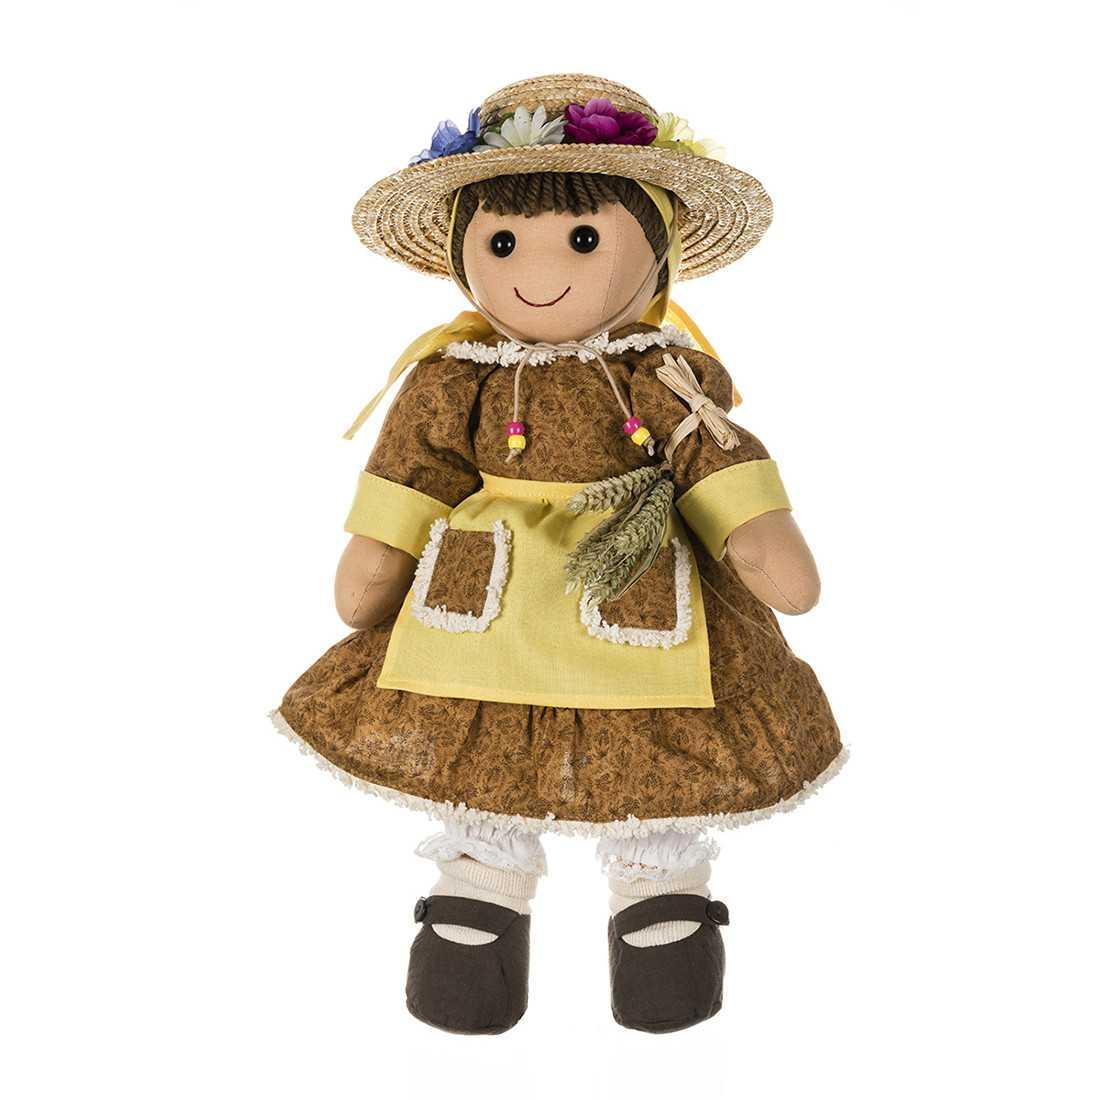 Bambola My Doll Contadina 42 cm shop online